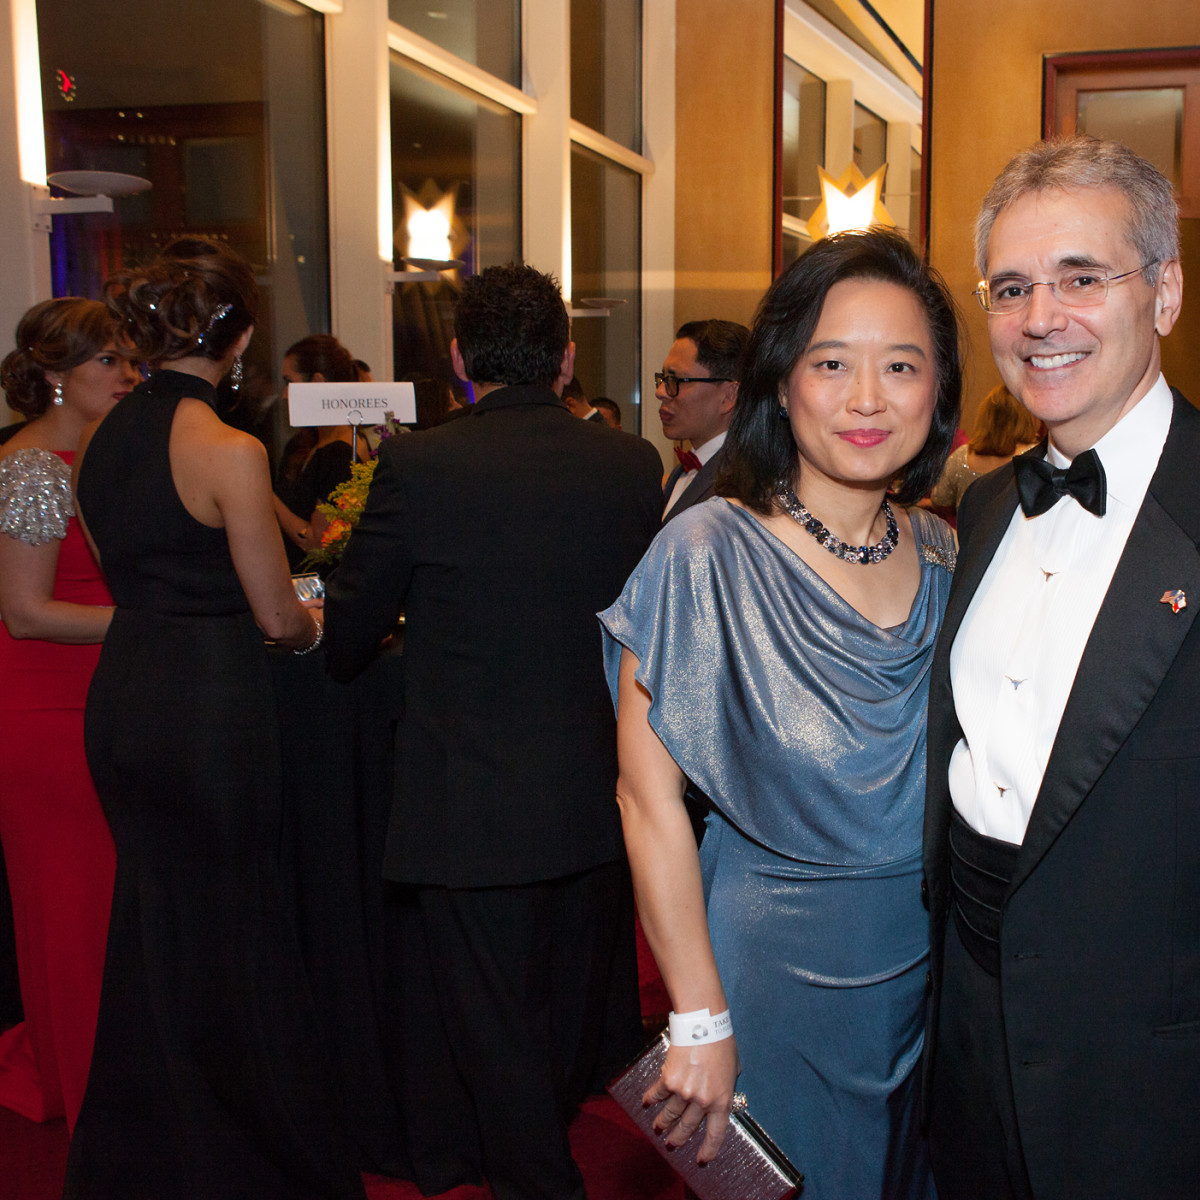 News, Shelby, Hispanic Chamber gala, Nov. 2015, Dr. Lynda Chin, Dr. Ron DePinho